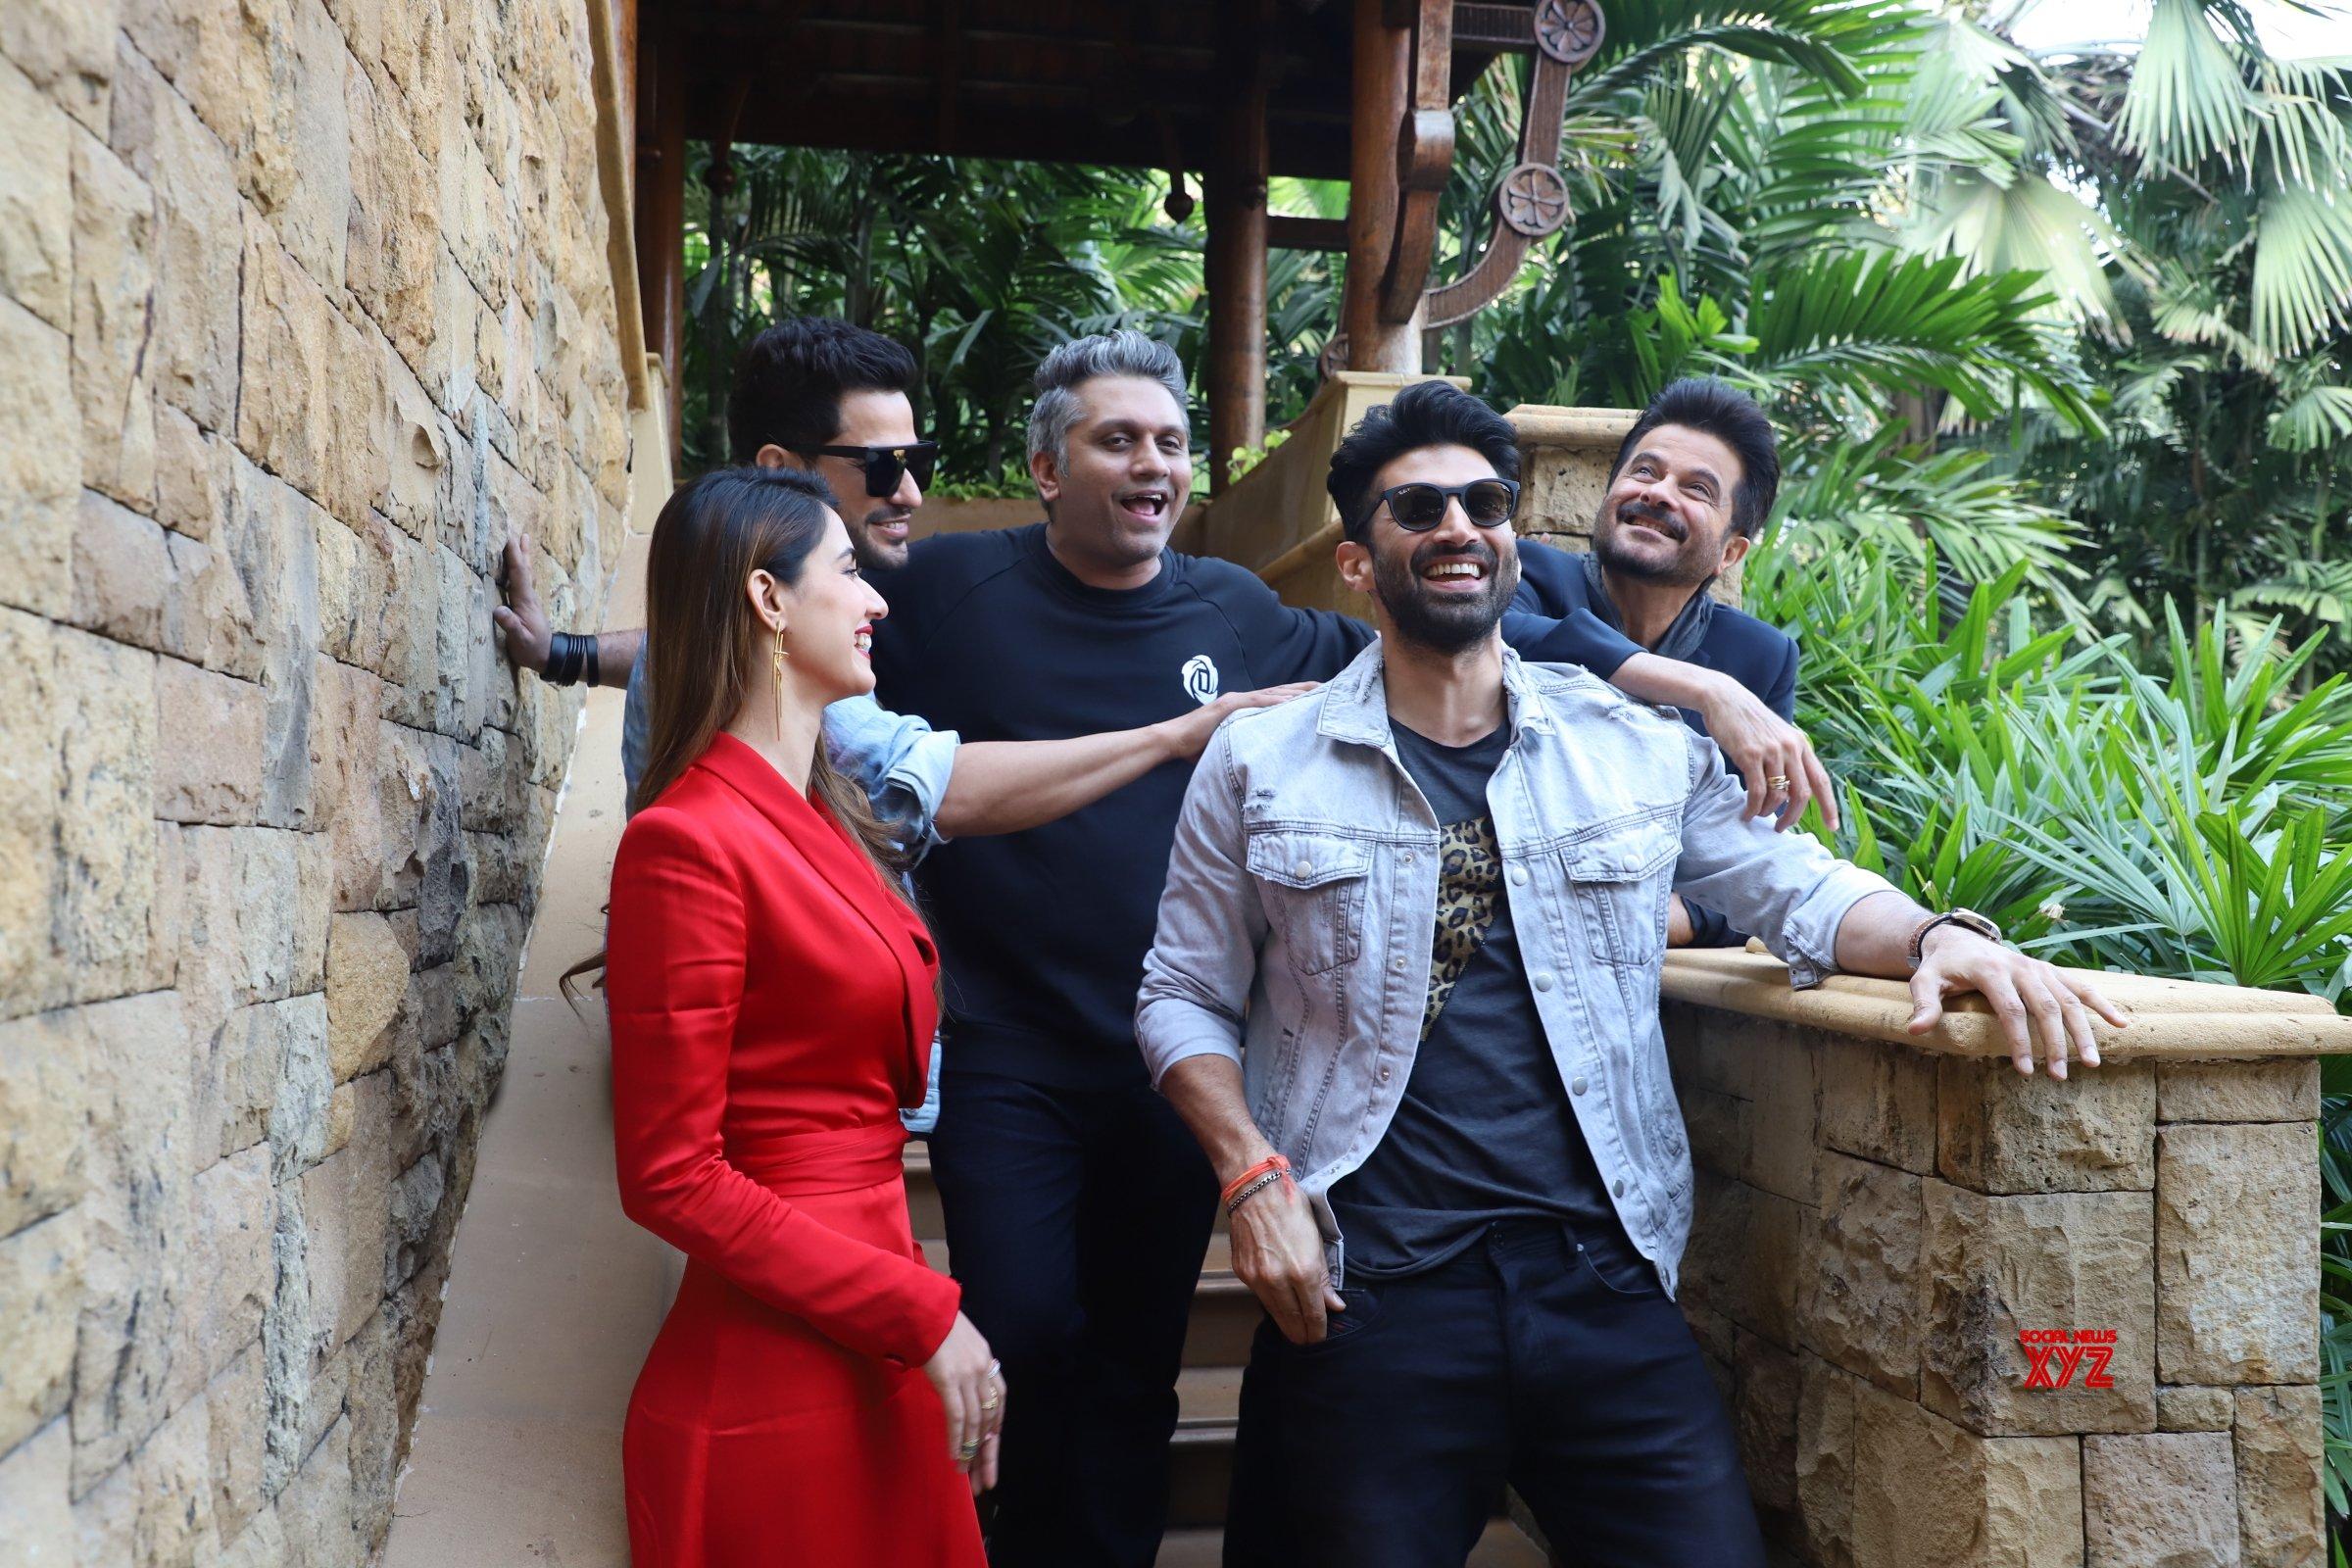 Disha Patani Aditya Roy Kapoor Anil Kapoor And Kunal Khemu Spotted Promoting Their Film Malang At Jw Marriott In Juhu Gallery Social News Xyz